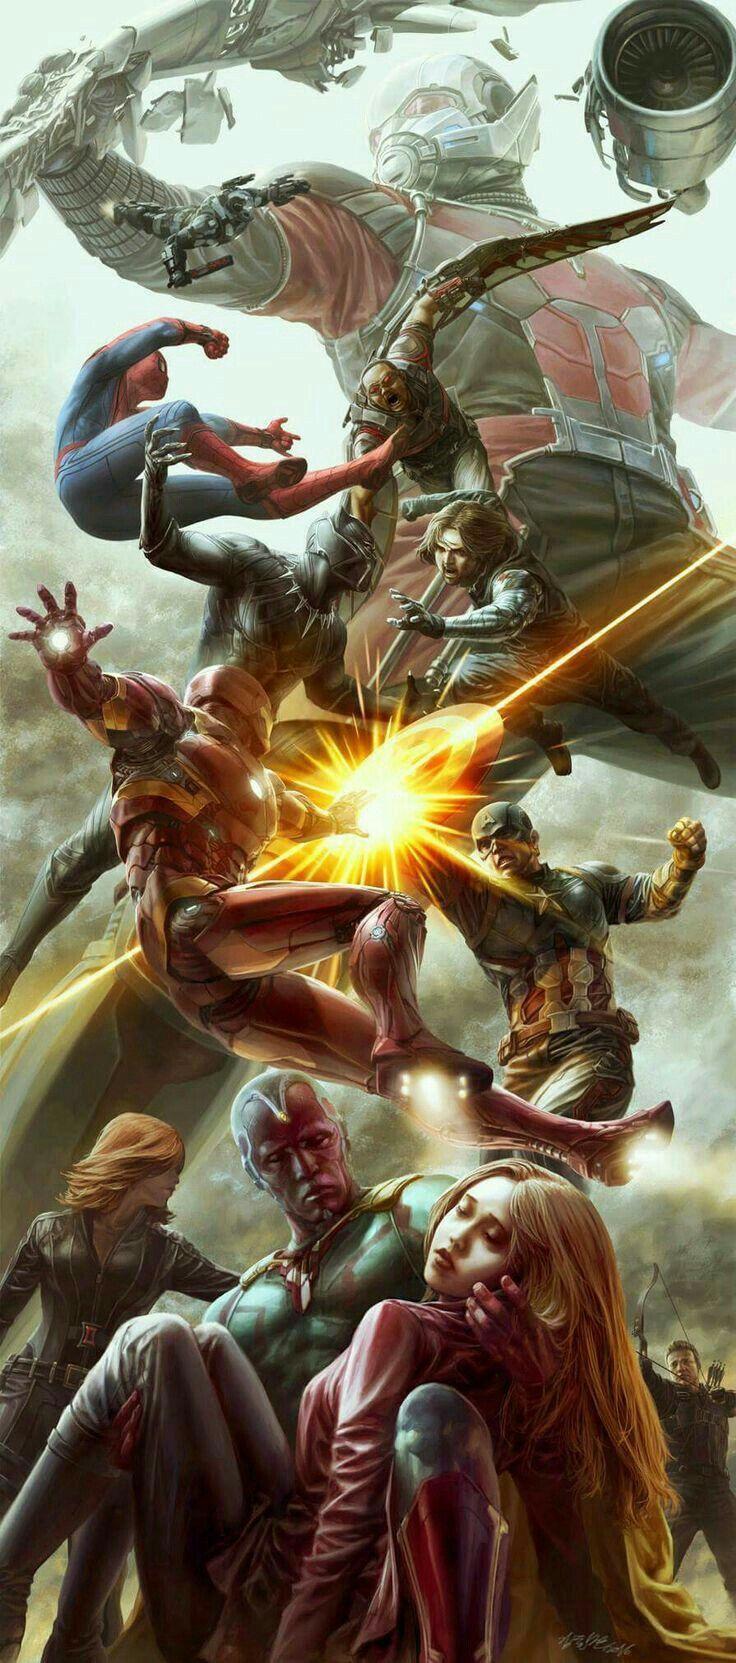 Os Vingadores, avante pra porrada!